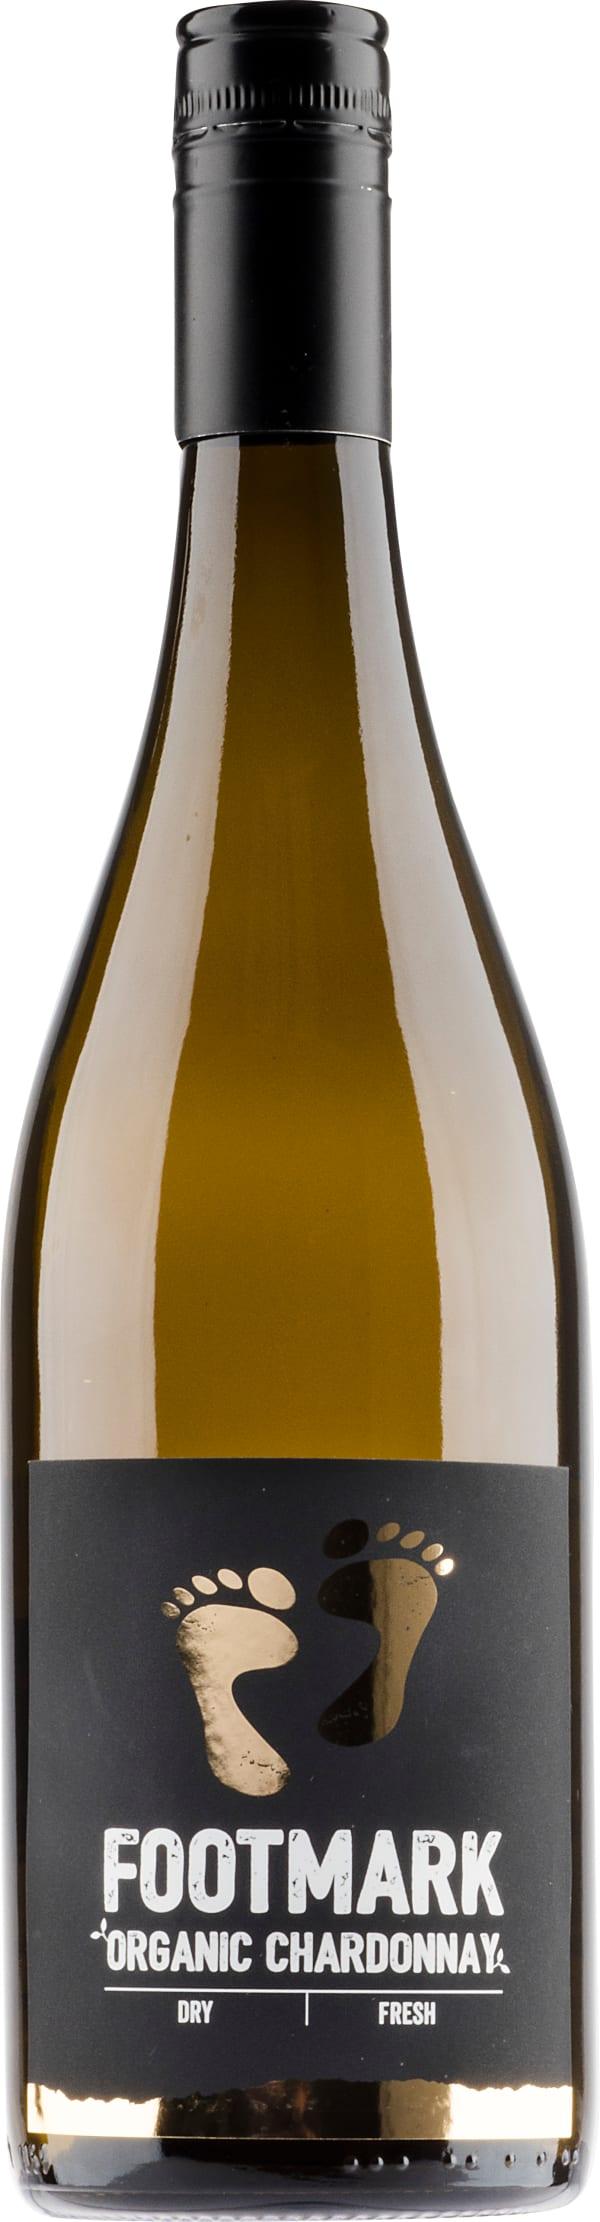 Footmark Organic Chardonnay 2019